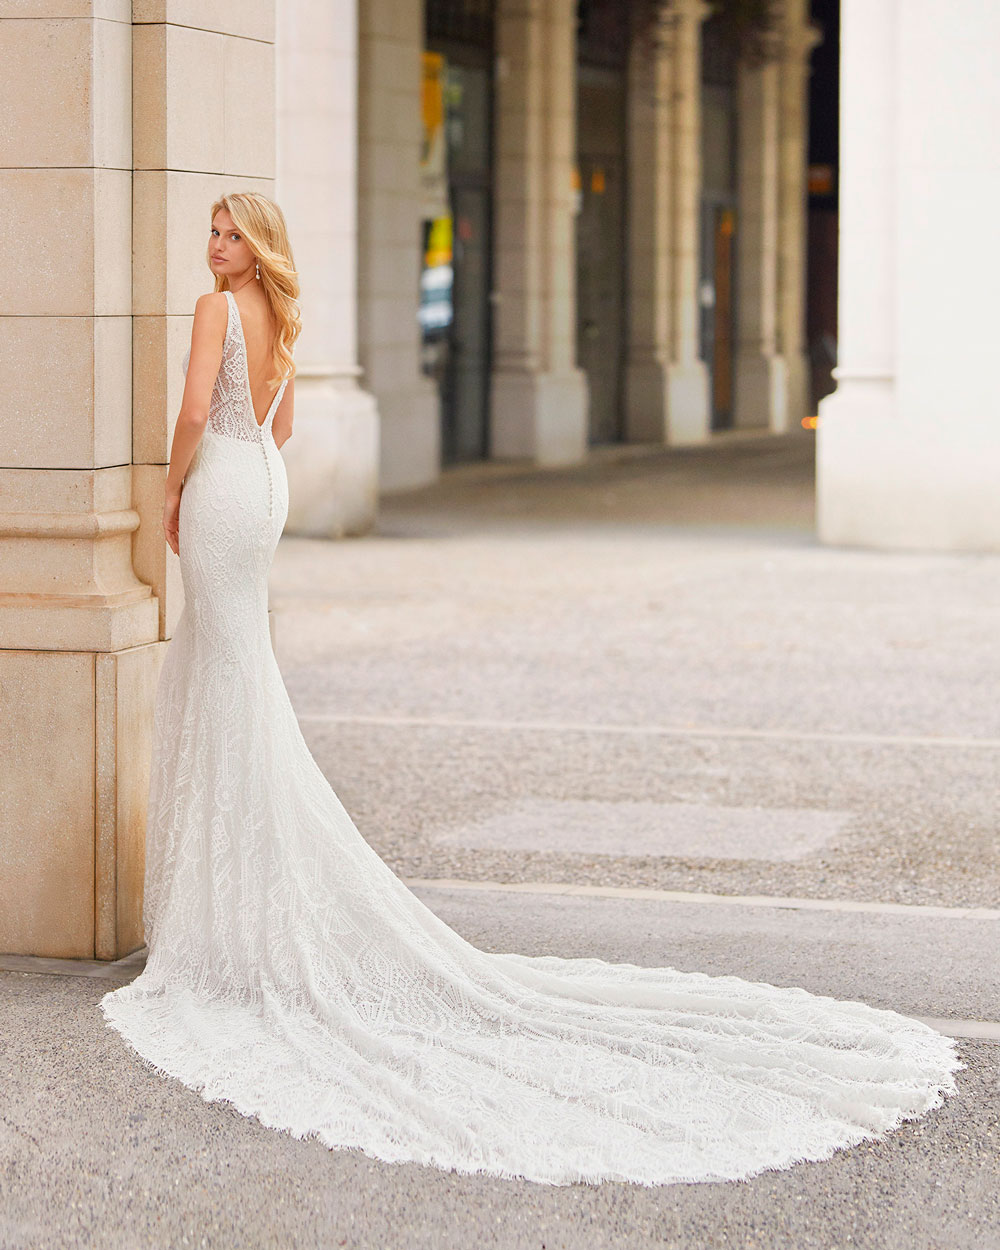 vestido de novia 2021 TATIANA ROSA CLARA 2